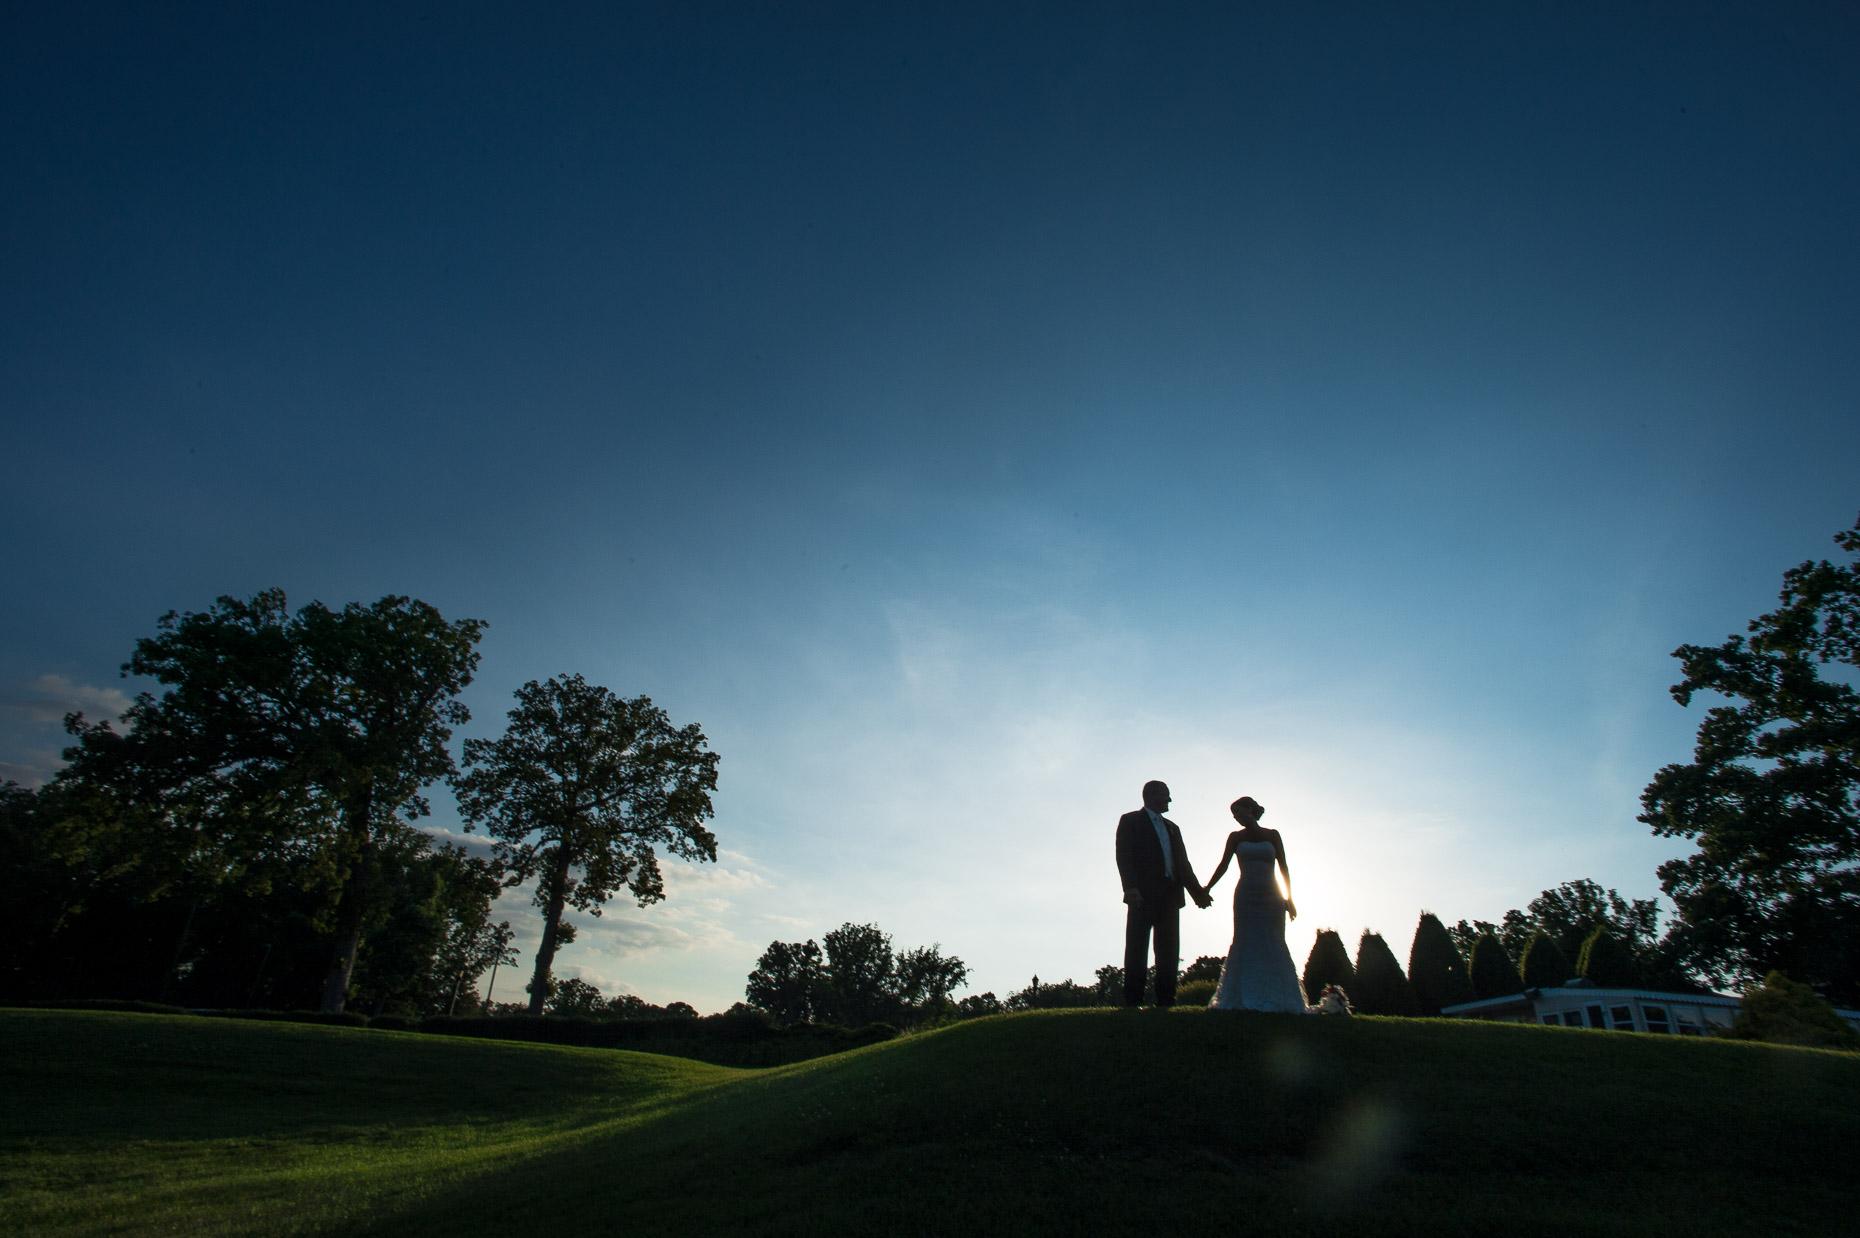 Weddings by Elliott O'Donovan - Washington DC_-33.jpg